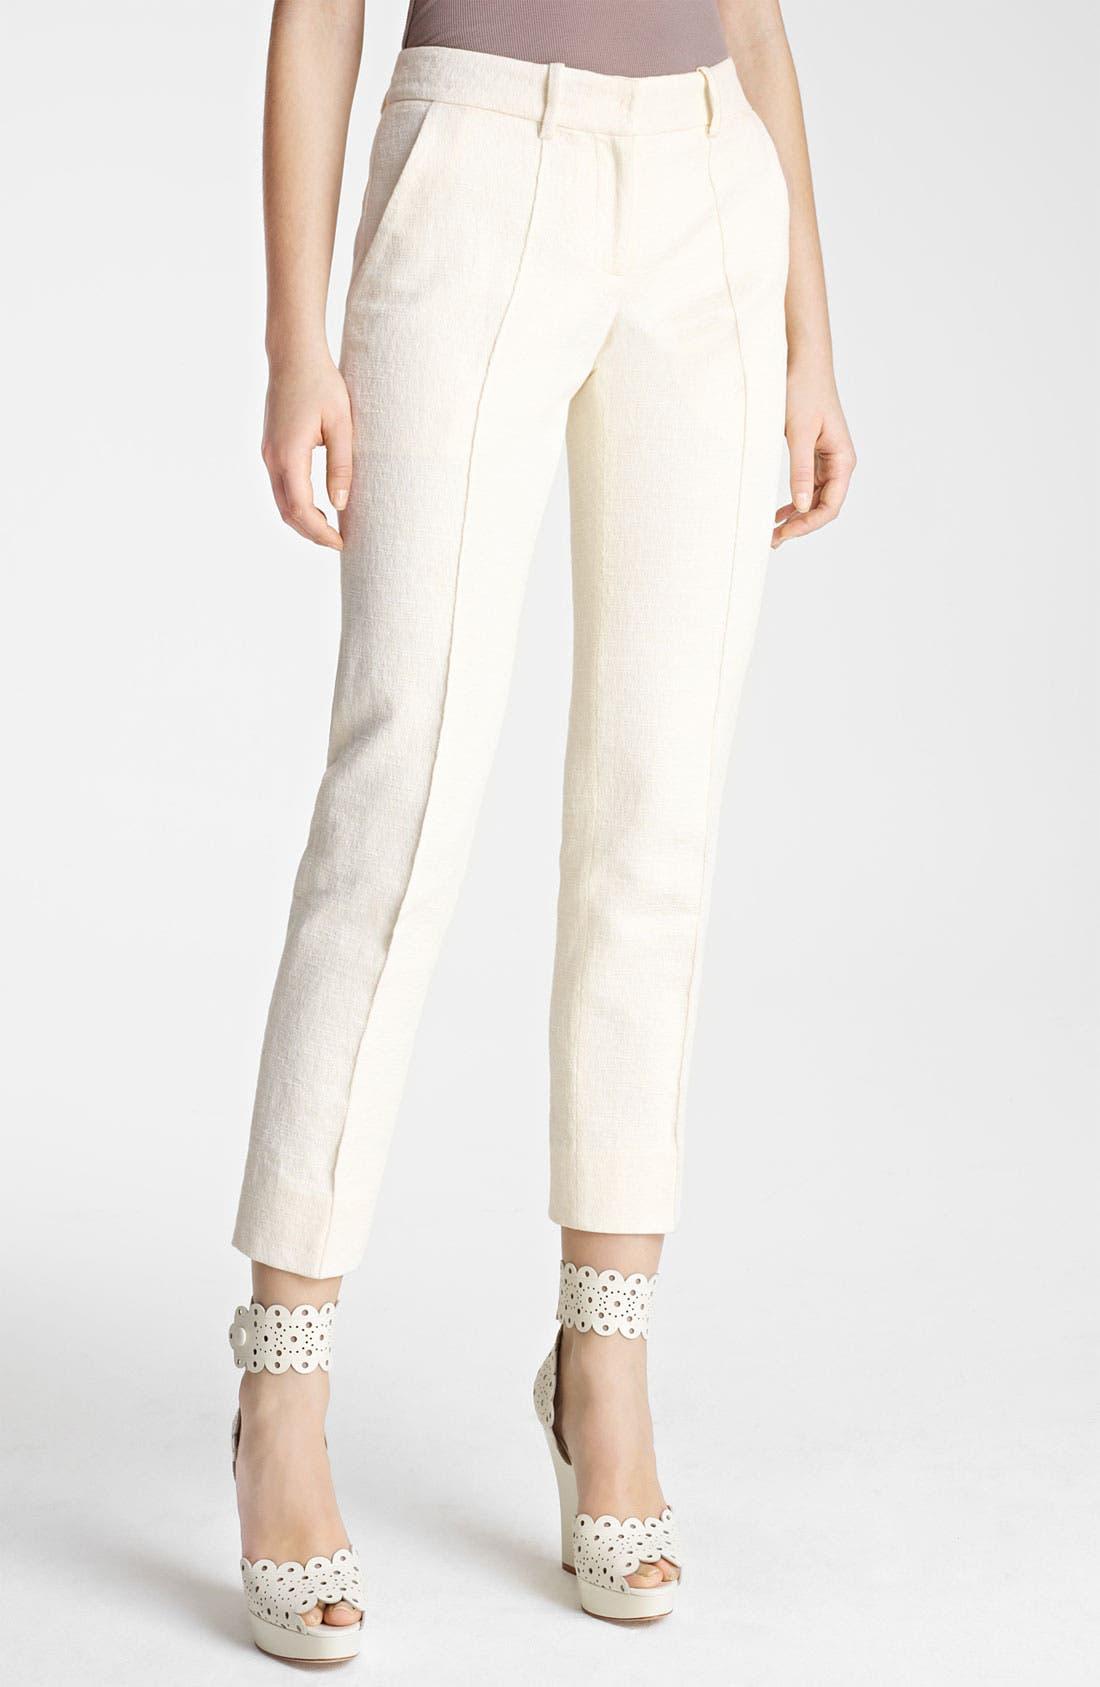 Alternate Image 1 Selected - Oscar de la Renta Skinny Textured Crop Pants